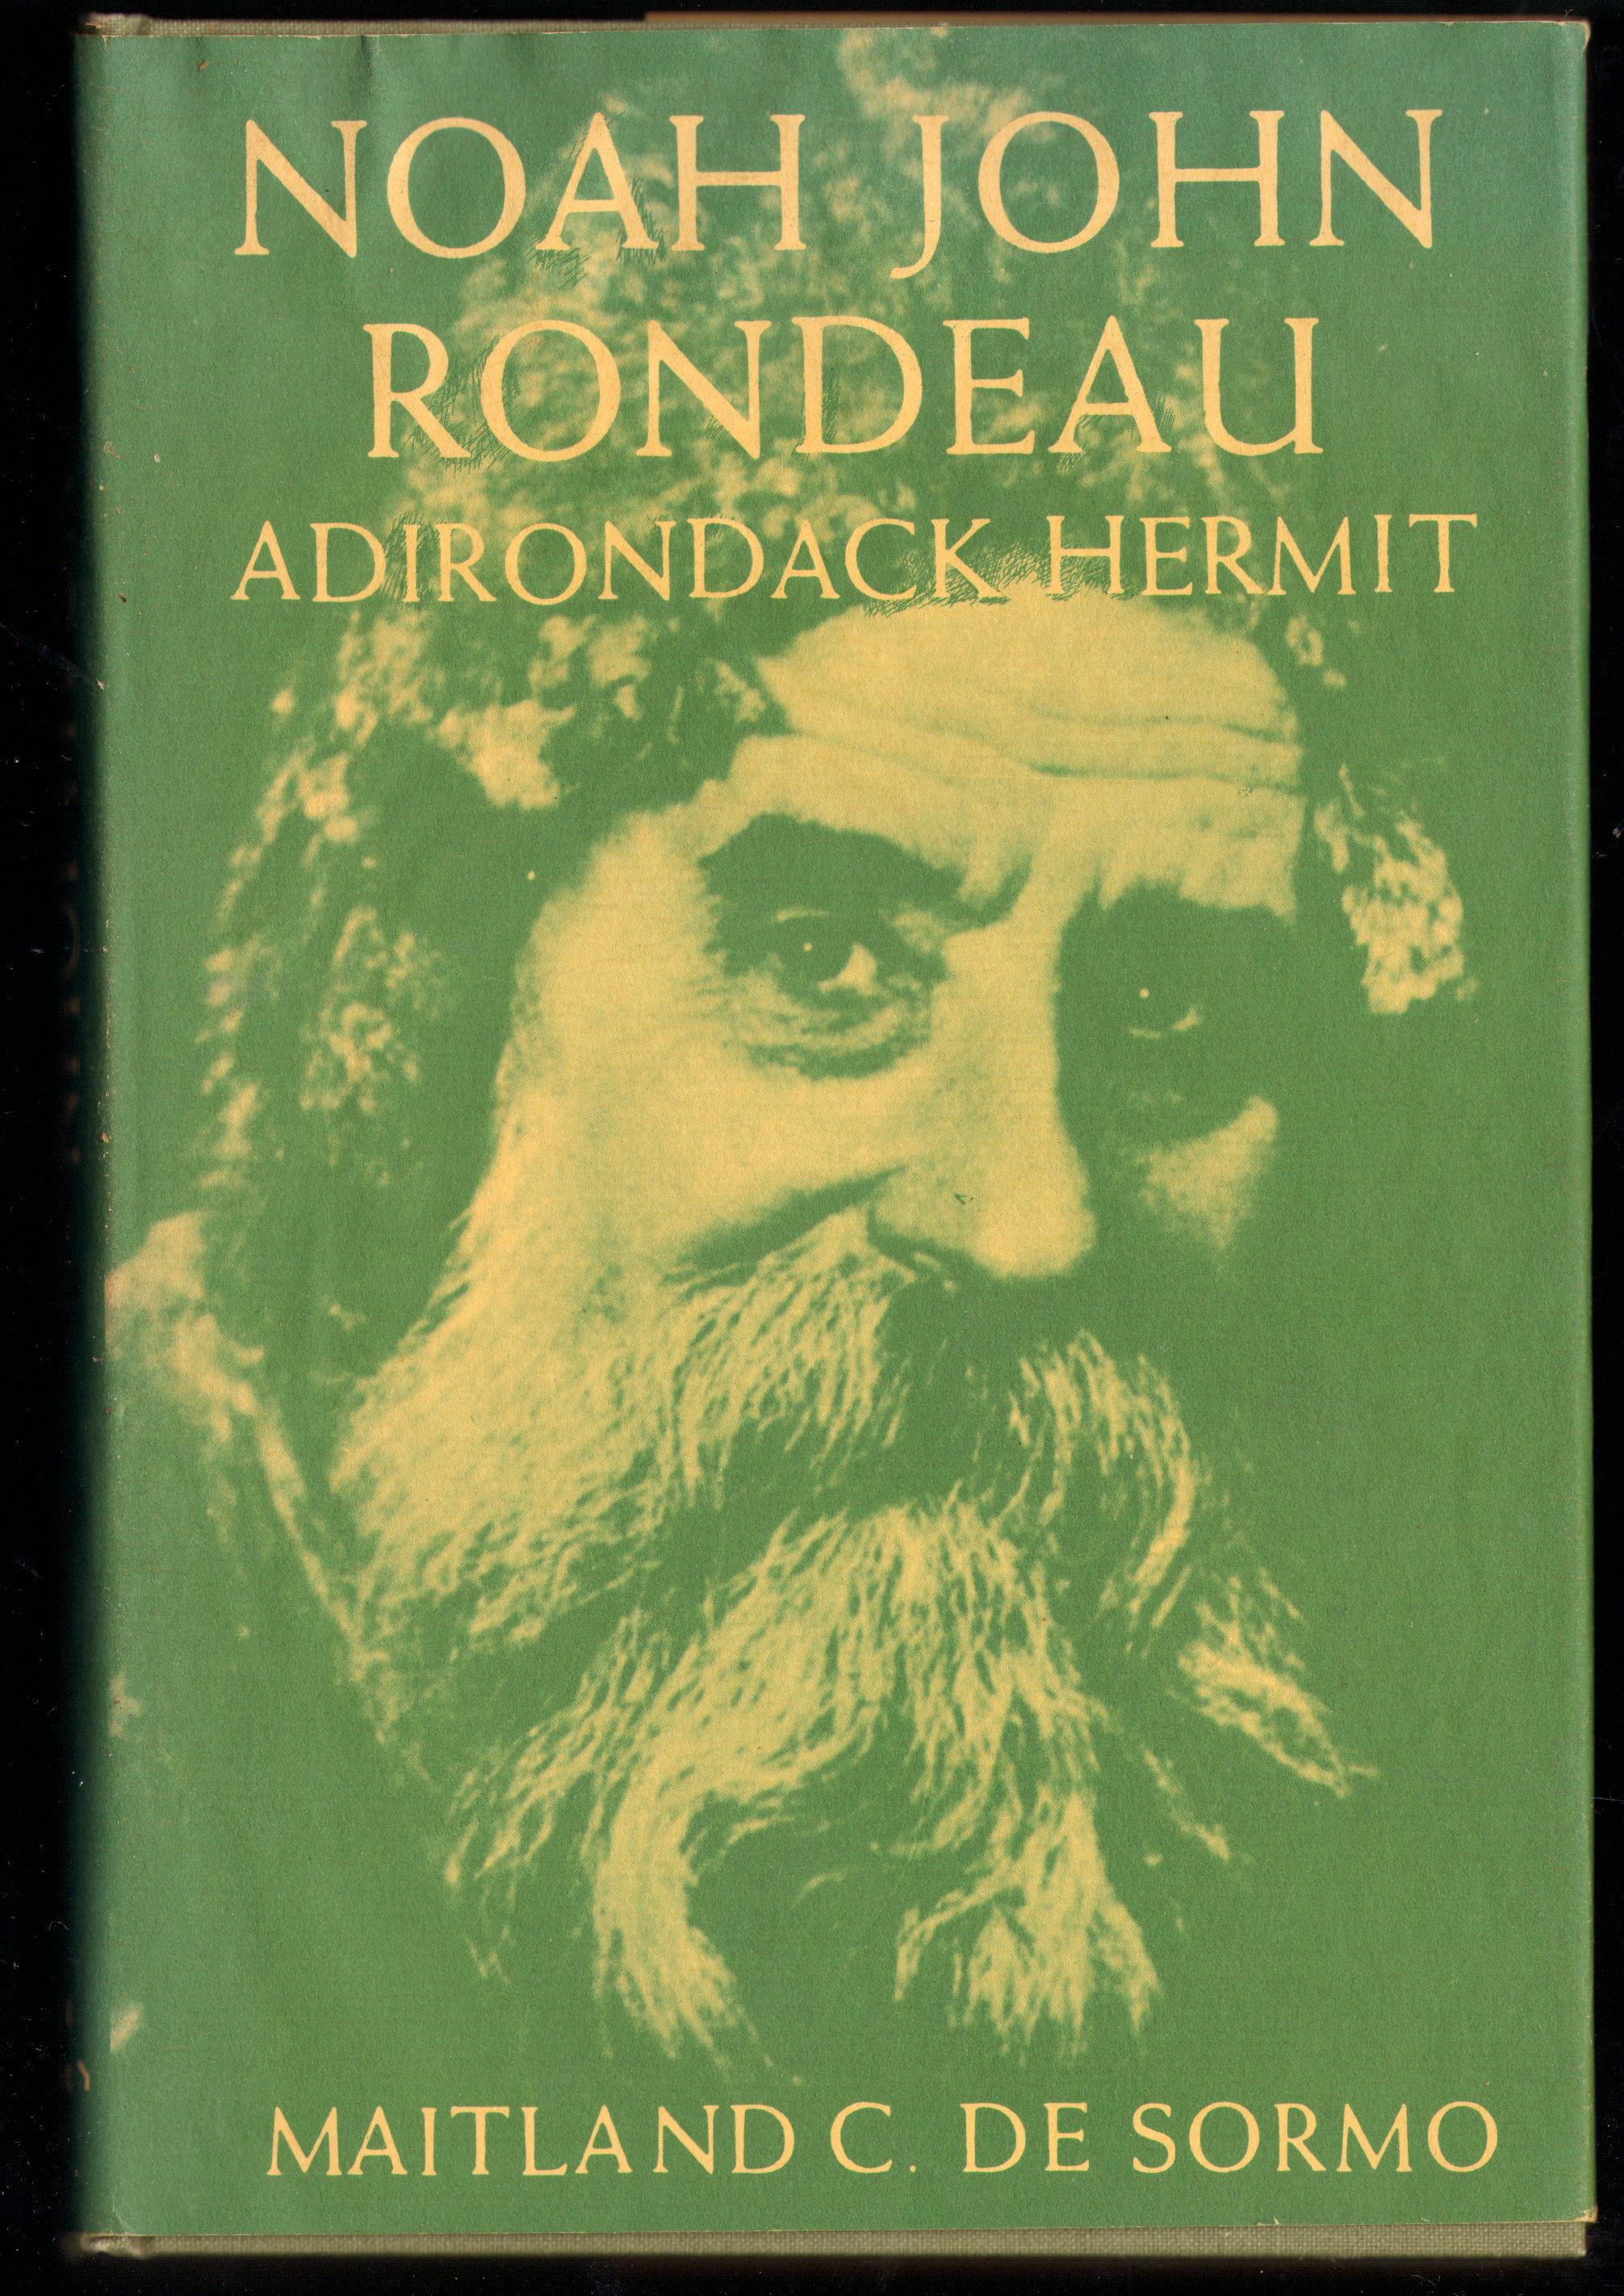 Image for Noah John Rondeau, Adirondack Hermit